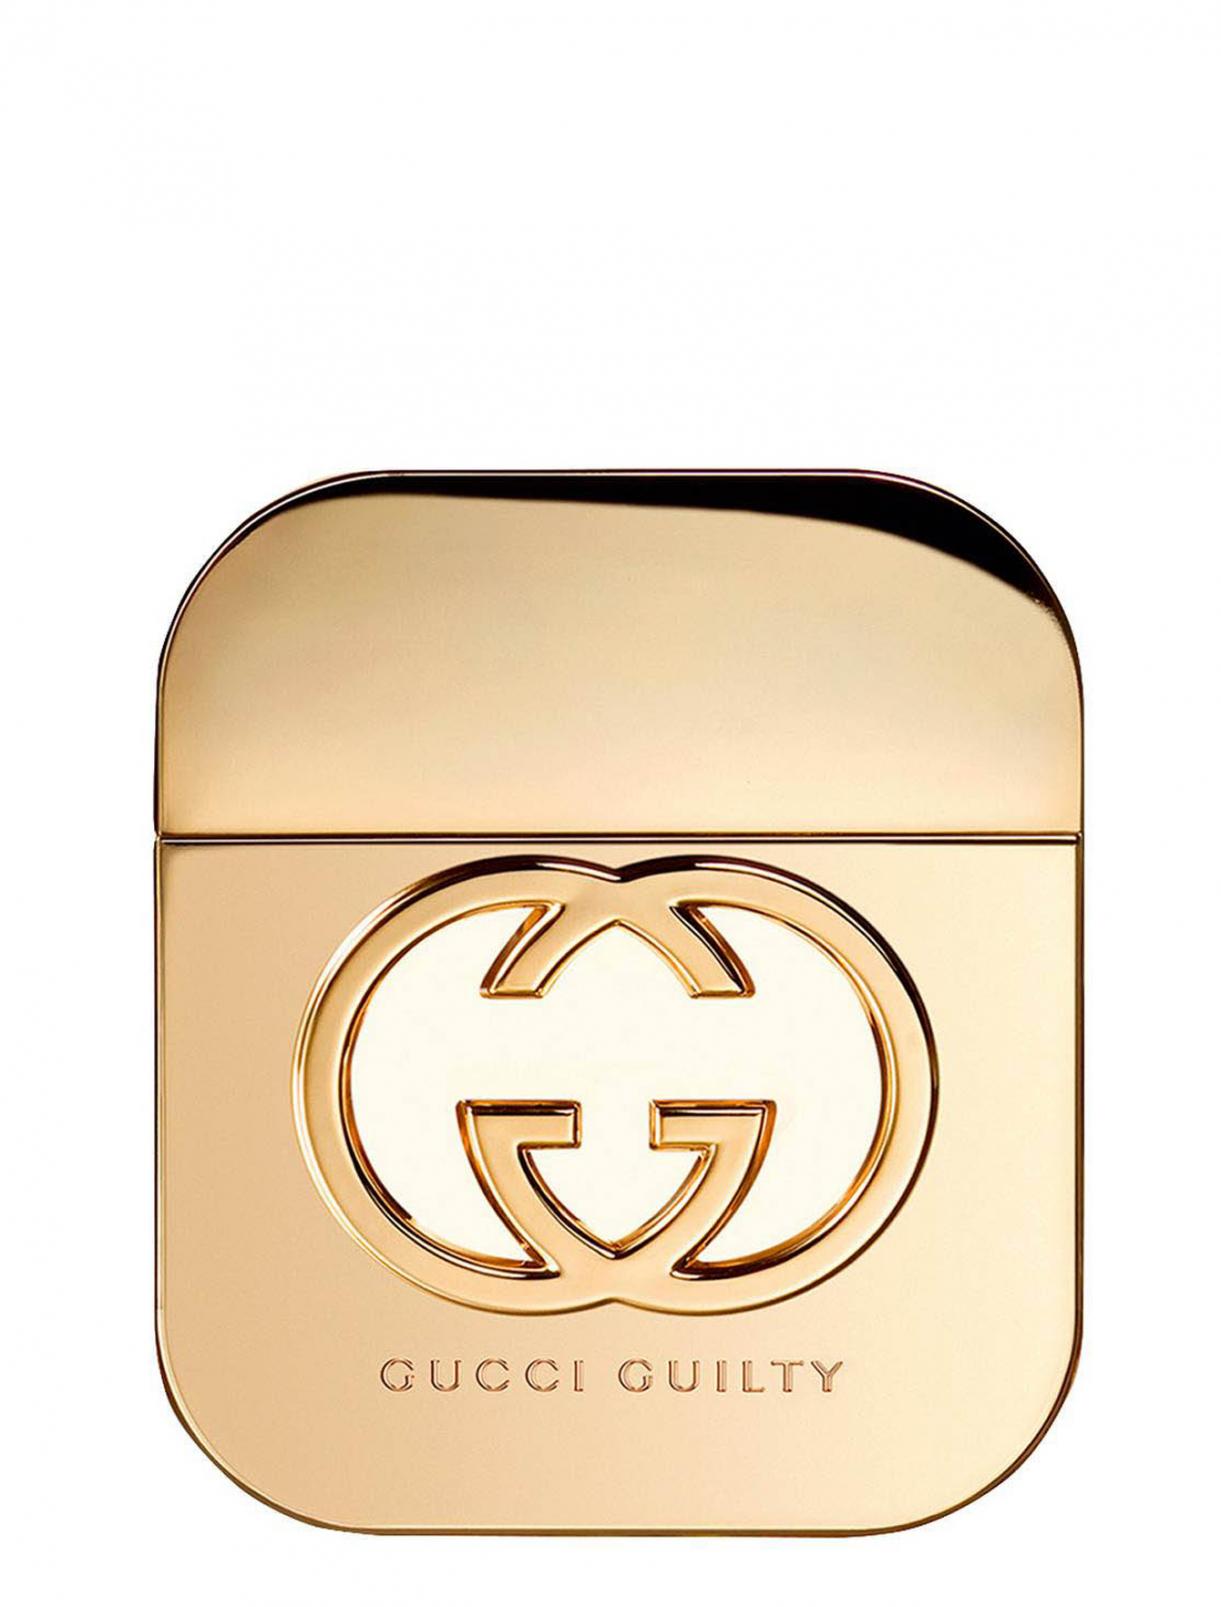 Туалетная вода - Guilty, 50ml Gucci  –  Общий вид